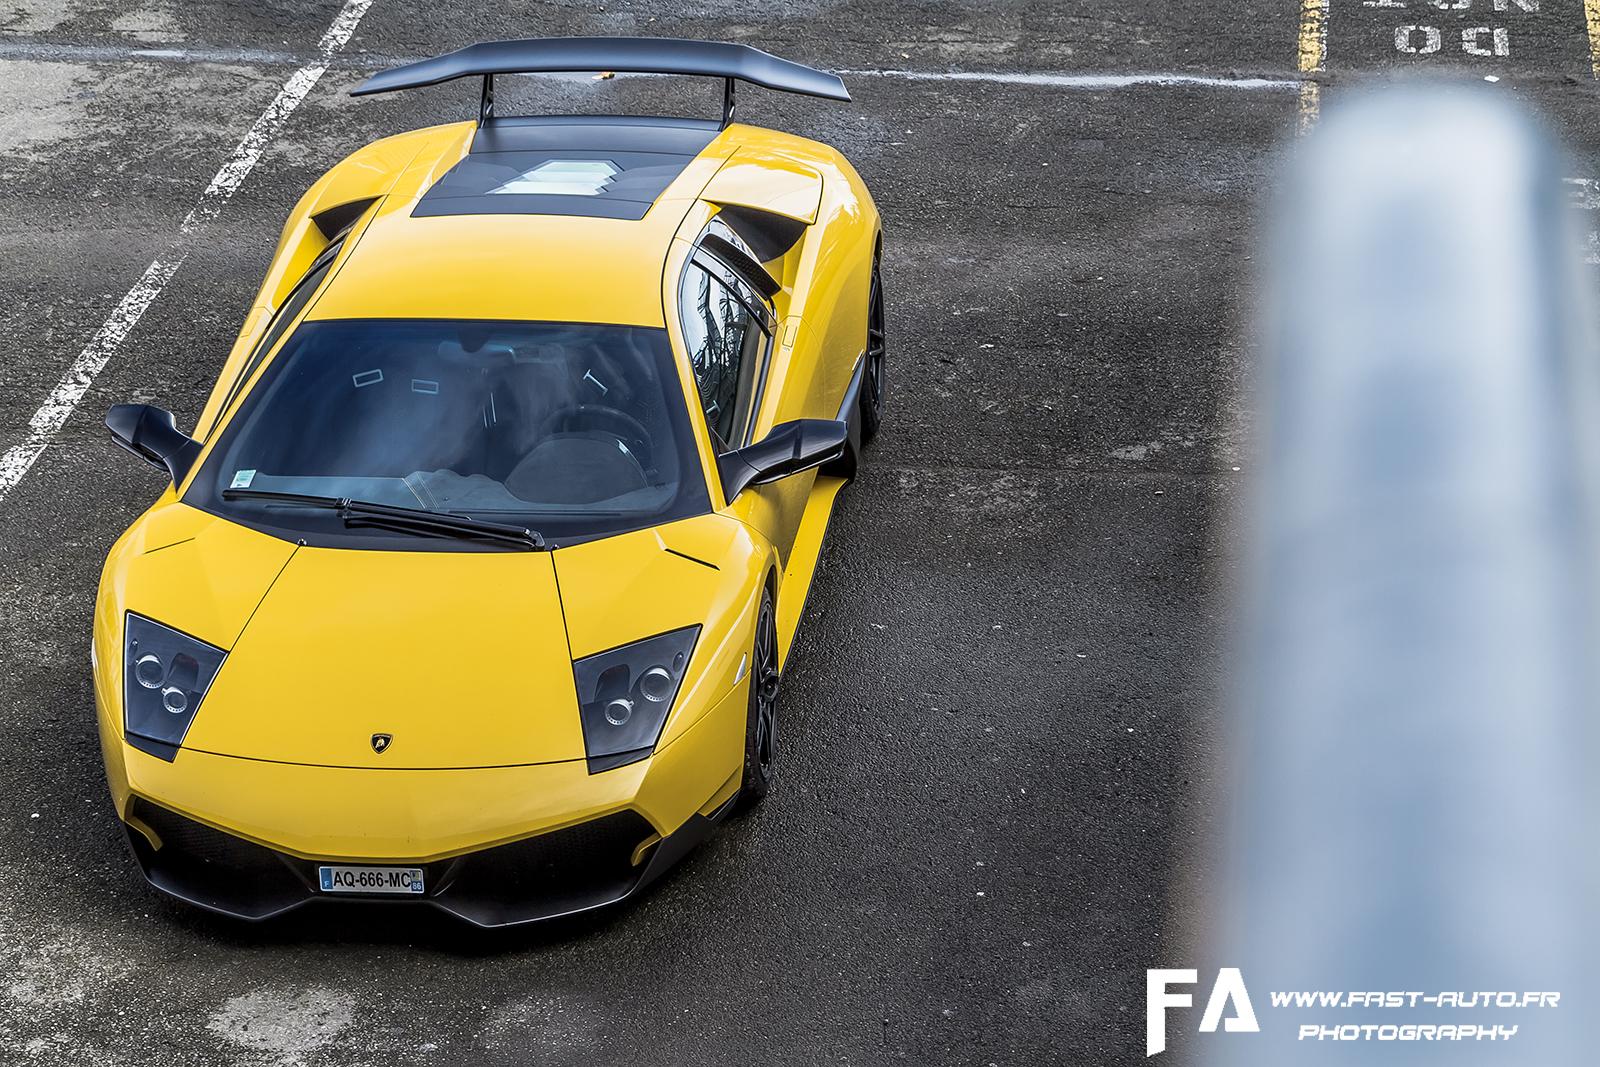 Wallpaper : city, urban, photography, clouds, yellow, Lamborghini ...